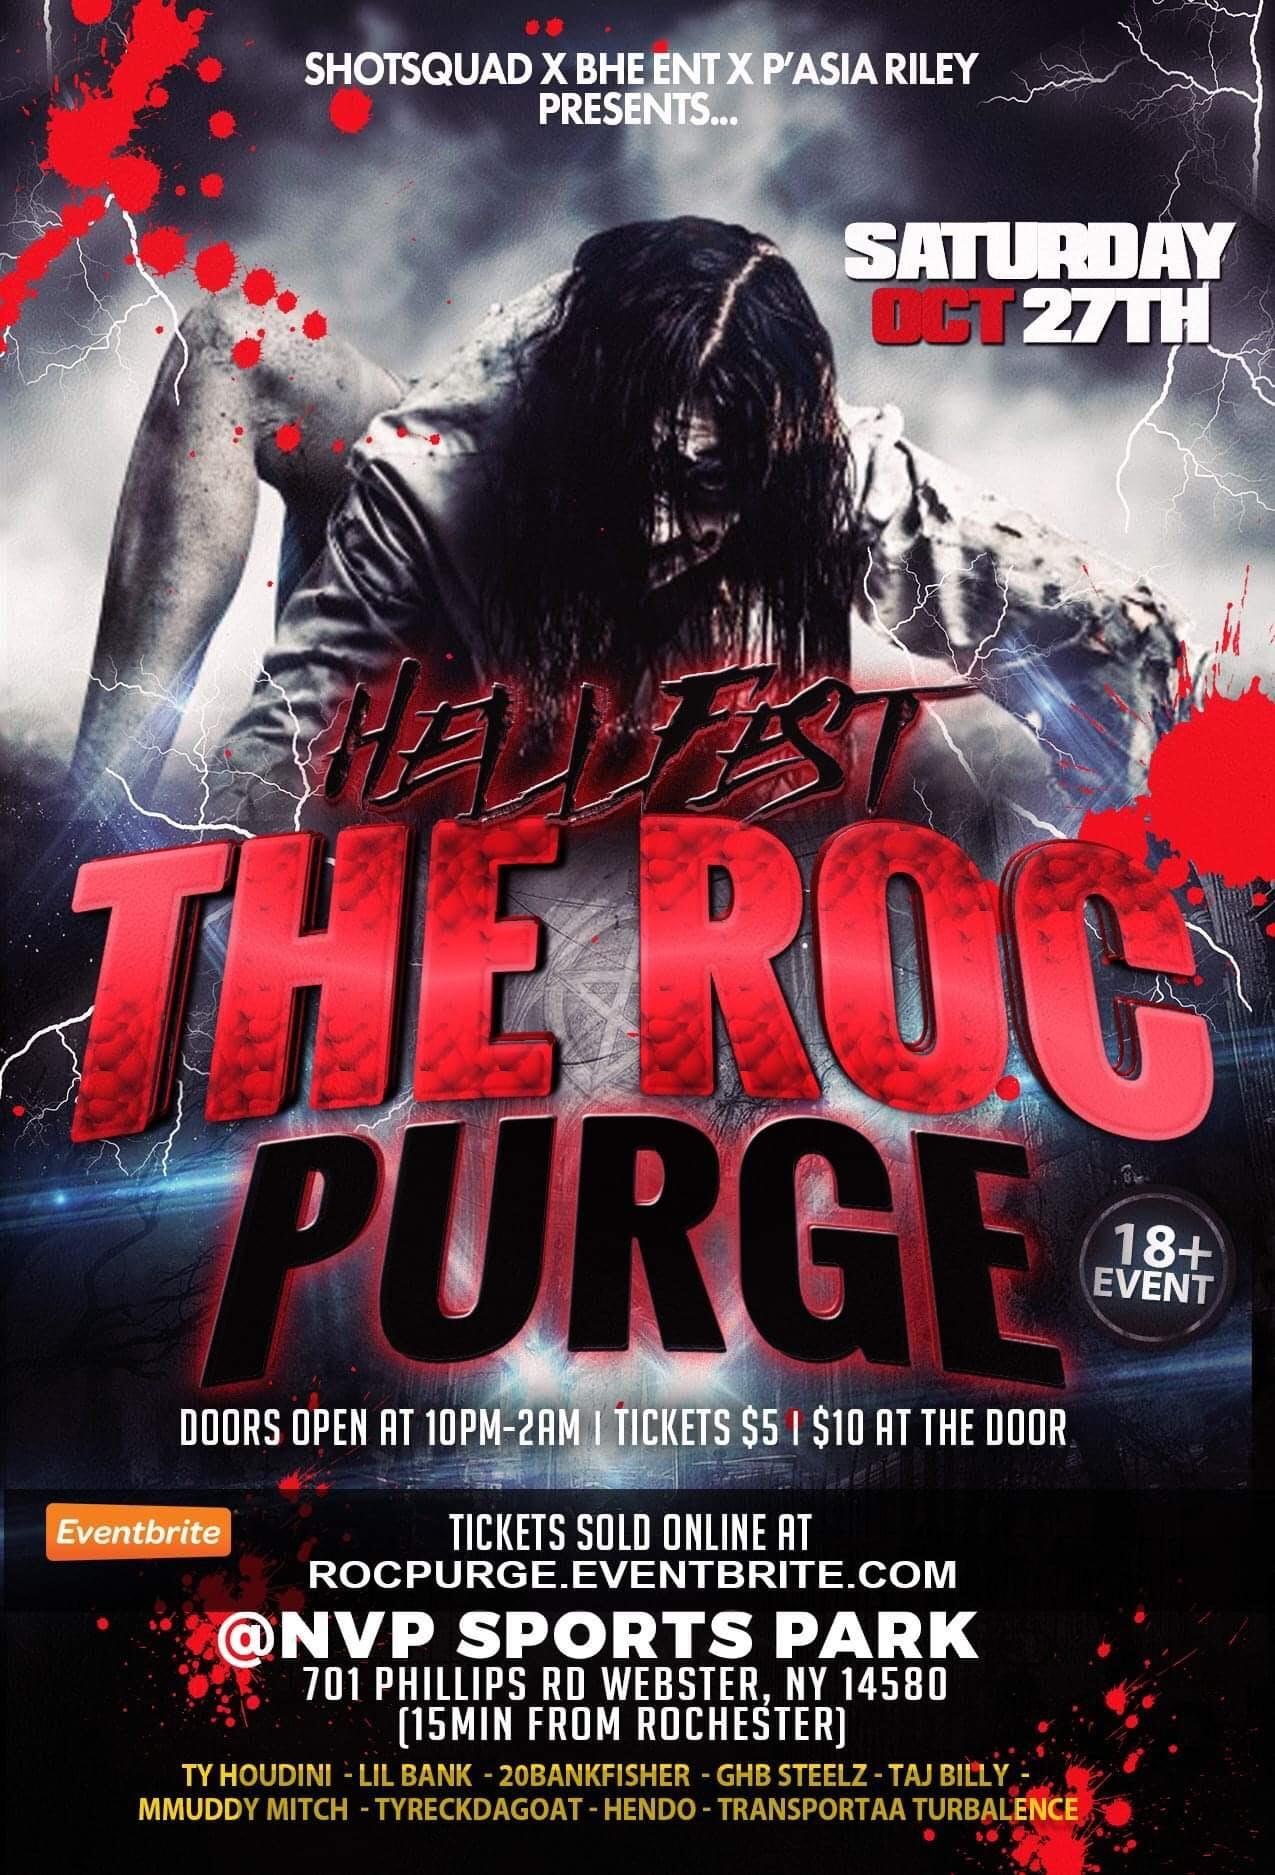 The Roc Purge Halloween Party  c812c5a66e60